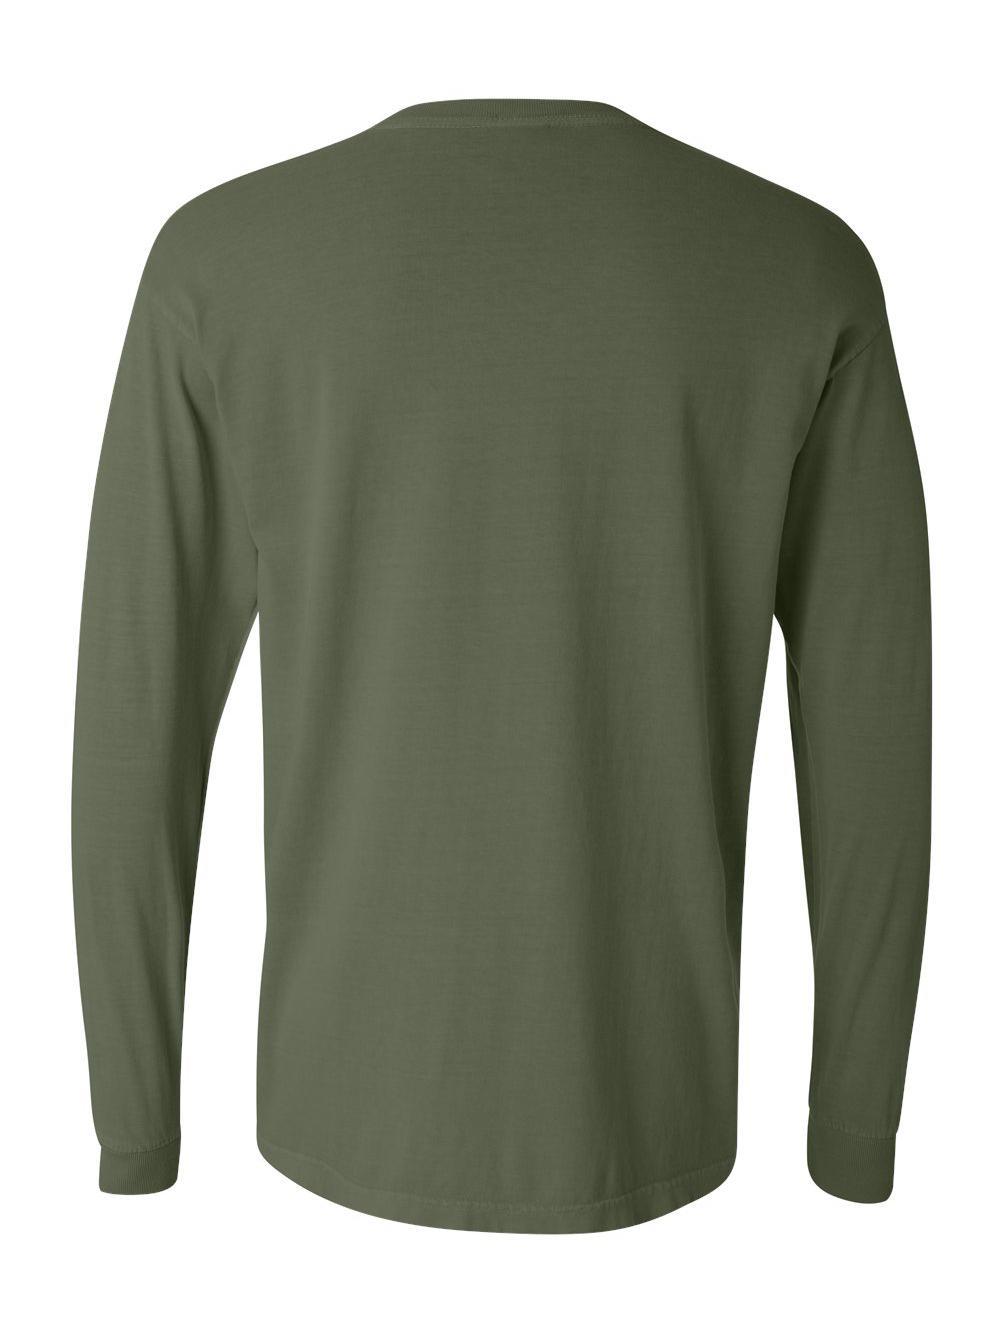 Comfort-Colors-Garment-Dyed-Heavyweight-Ringspun-Long-Sleeve-T-Shirt-6014 thumbnail 40